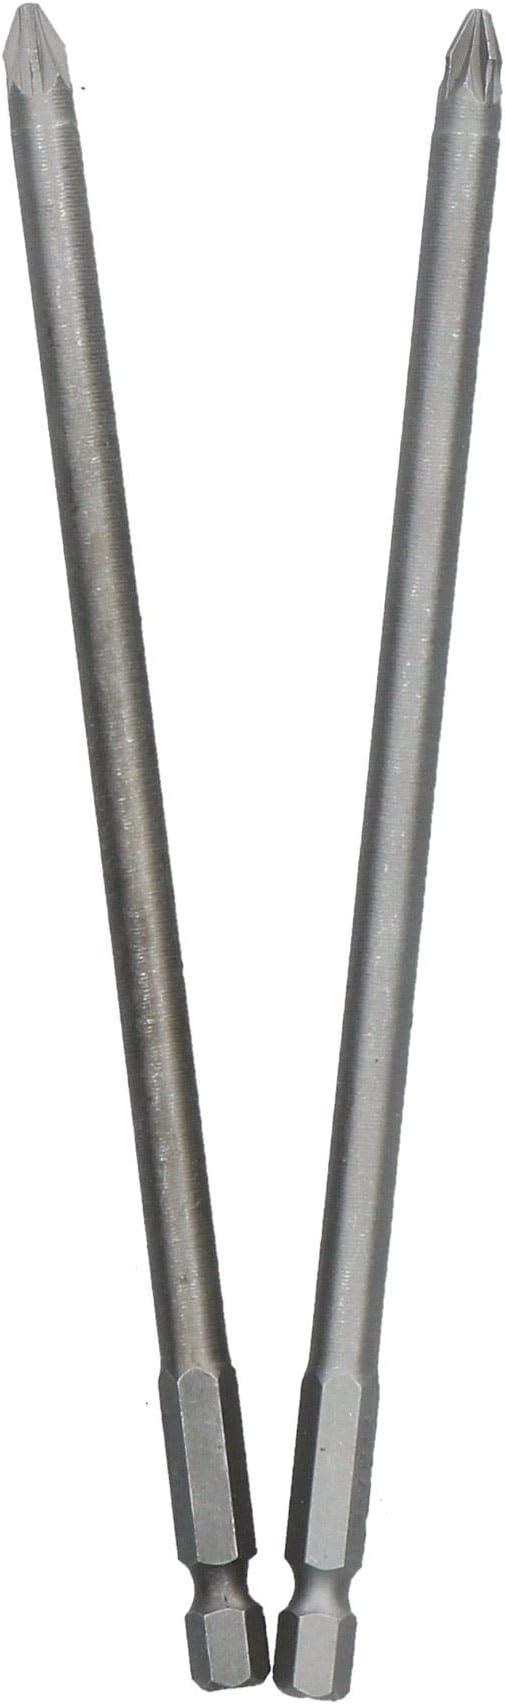 Blue Spot 2Pce Extra Long Shank PZ2 Screwdriver Bit Set 150mm Total Length